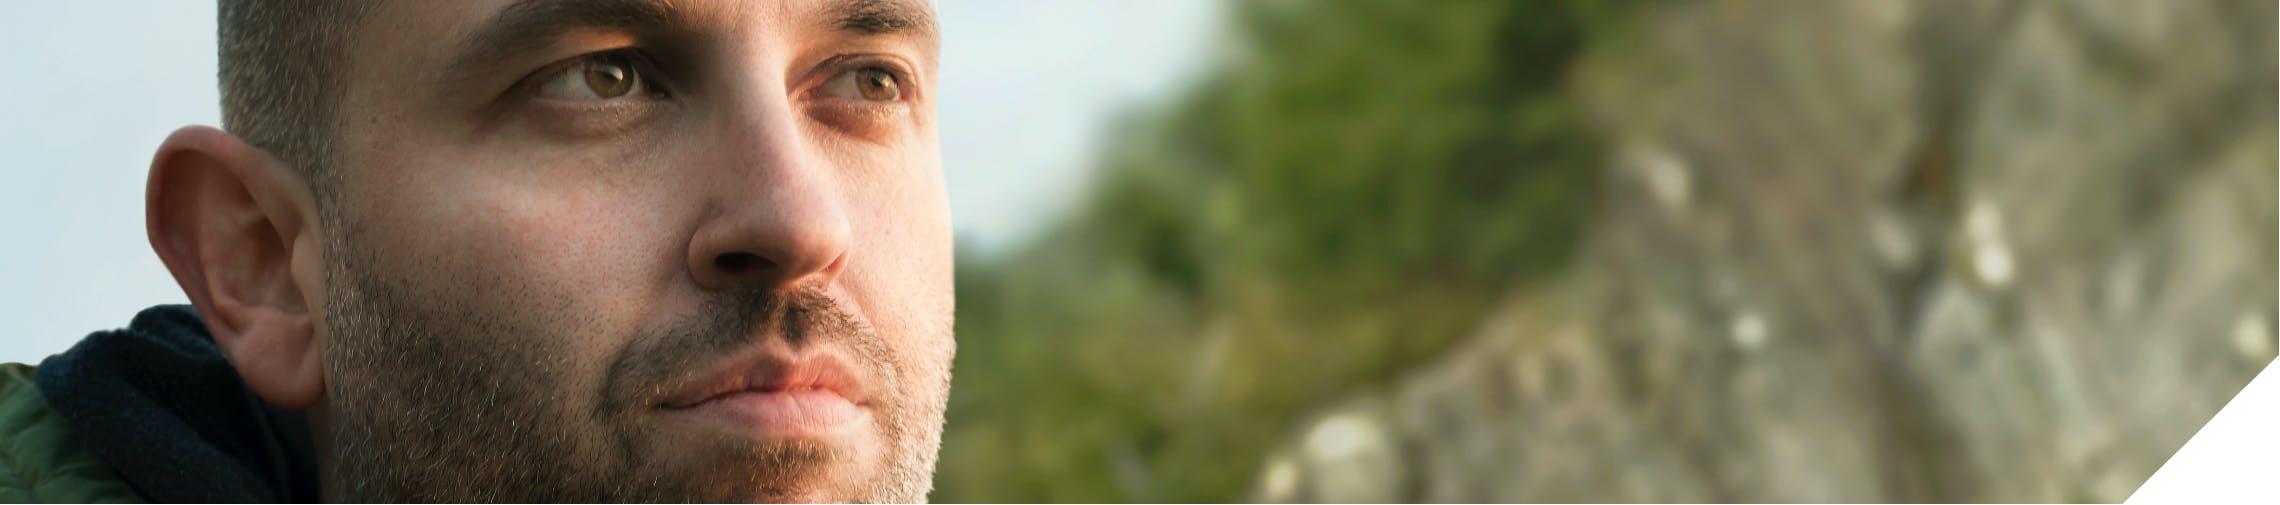 Male with severe eosinophilic asthma comorbid nasal polyps image